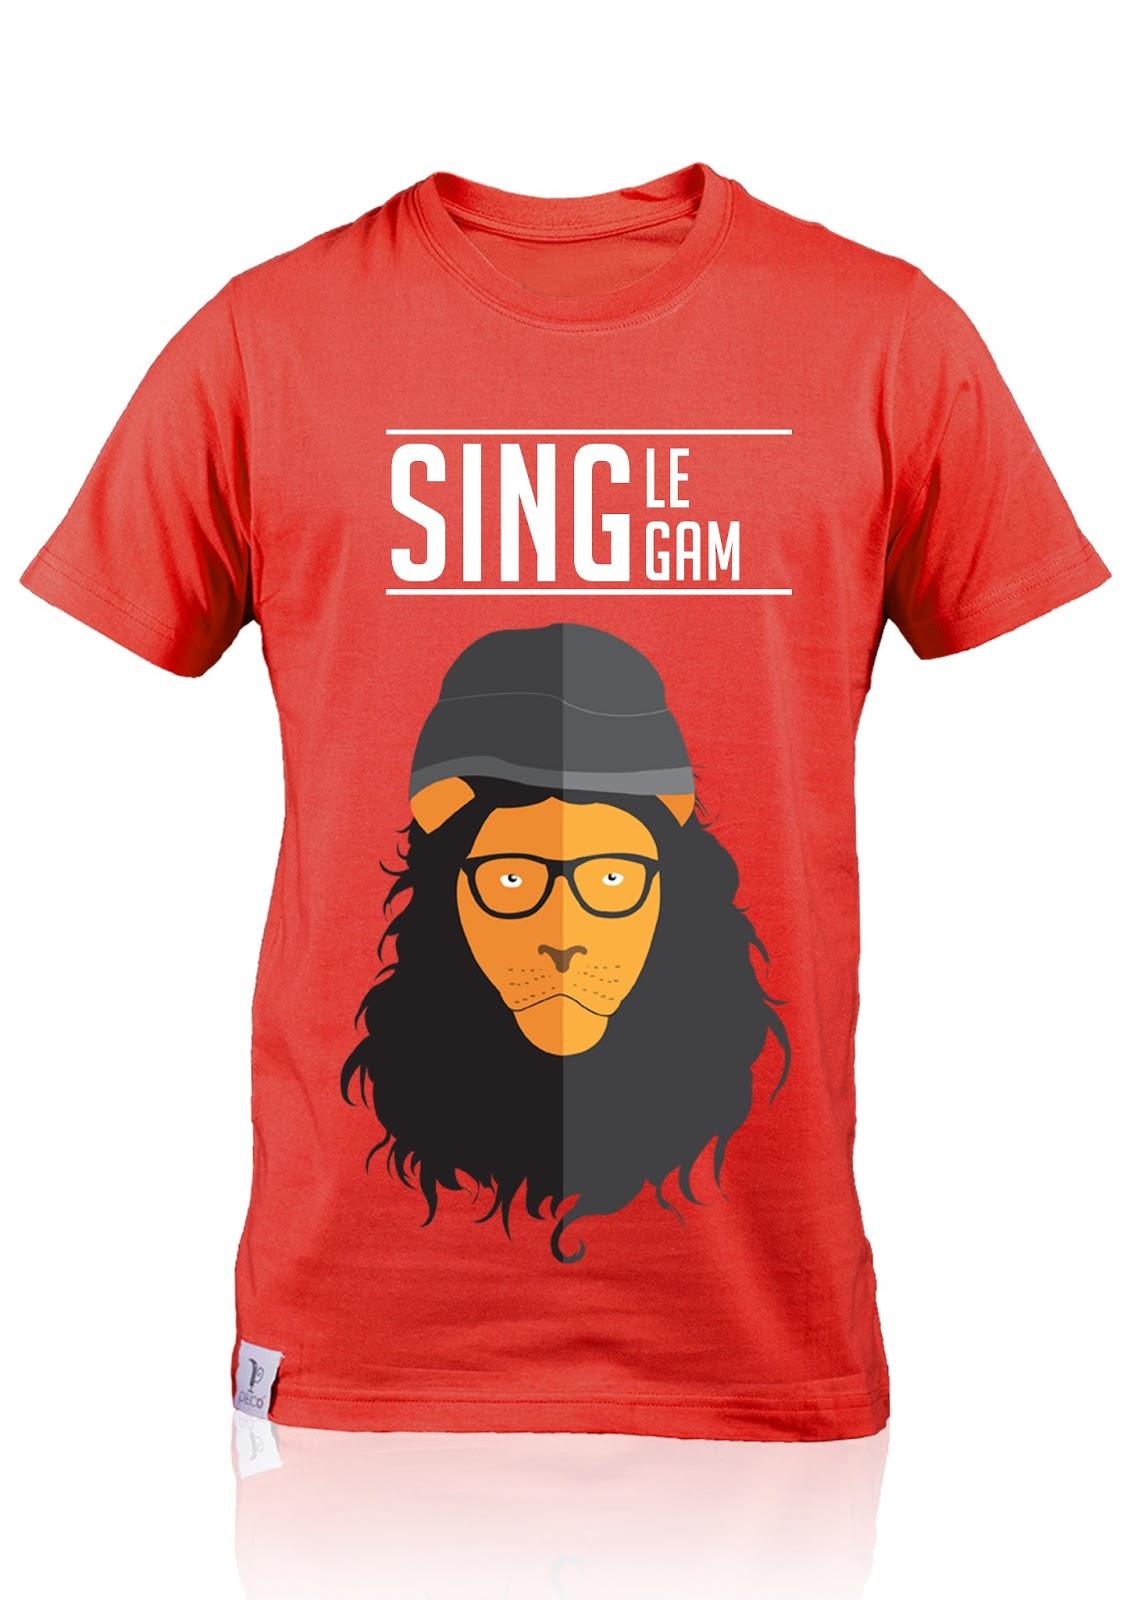 T shirt design youtube - T Shirt Design Youtube 65